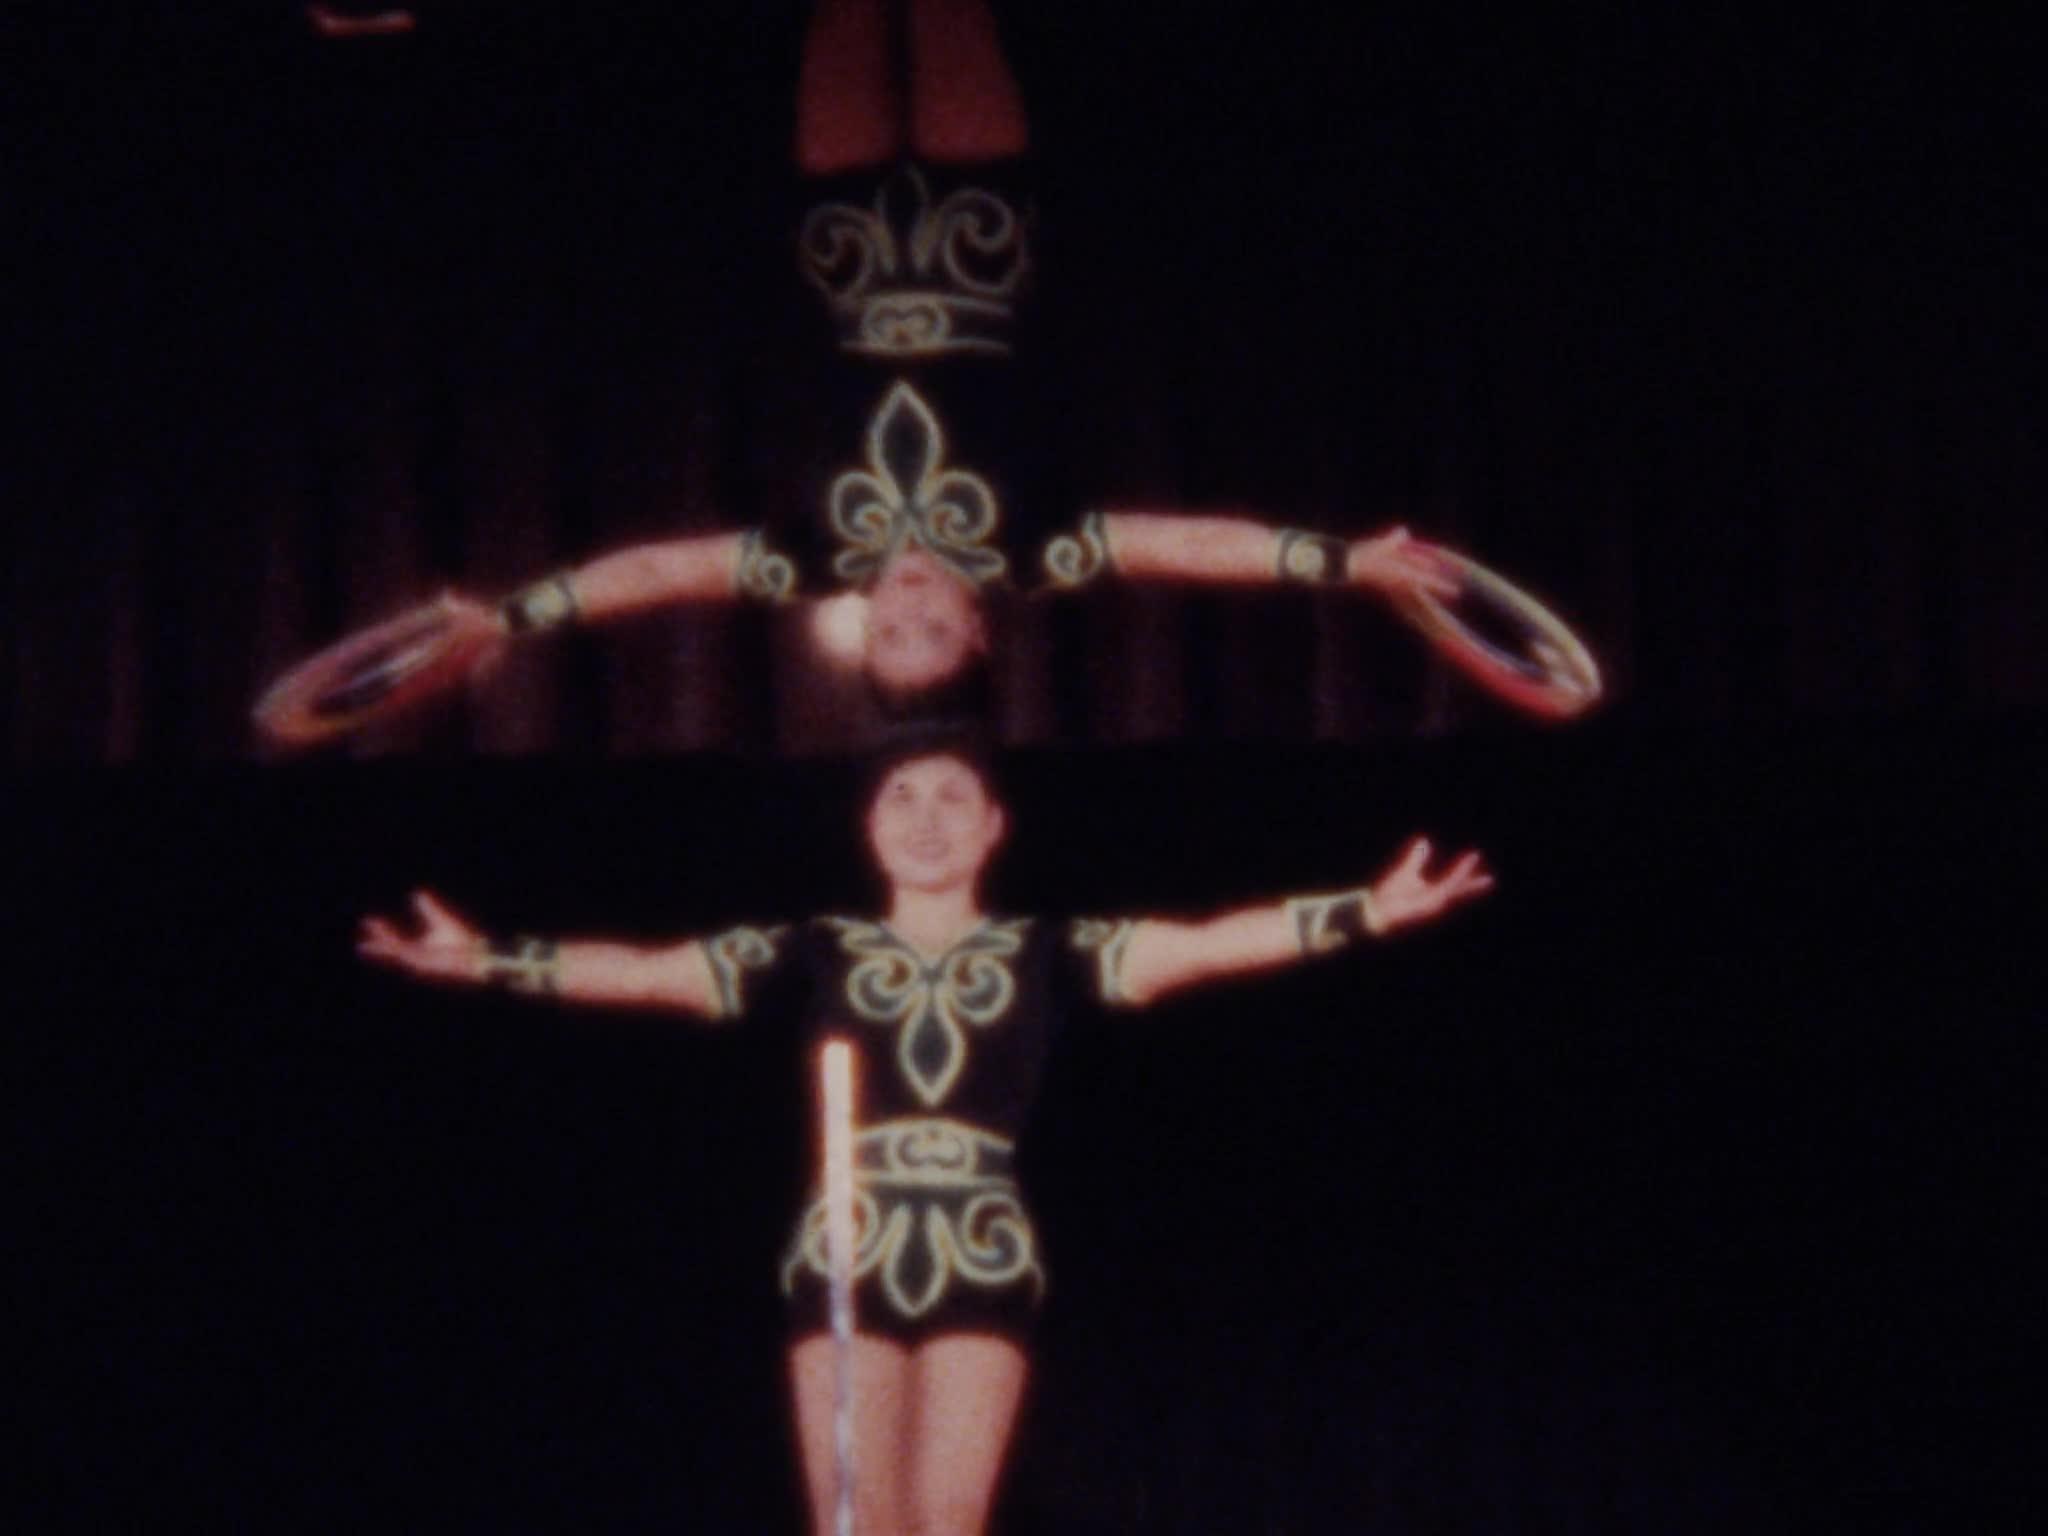 Chinese Performers, Big Jug, Balancing, Juggling and Arial Acts